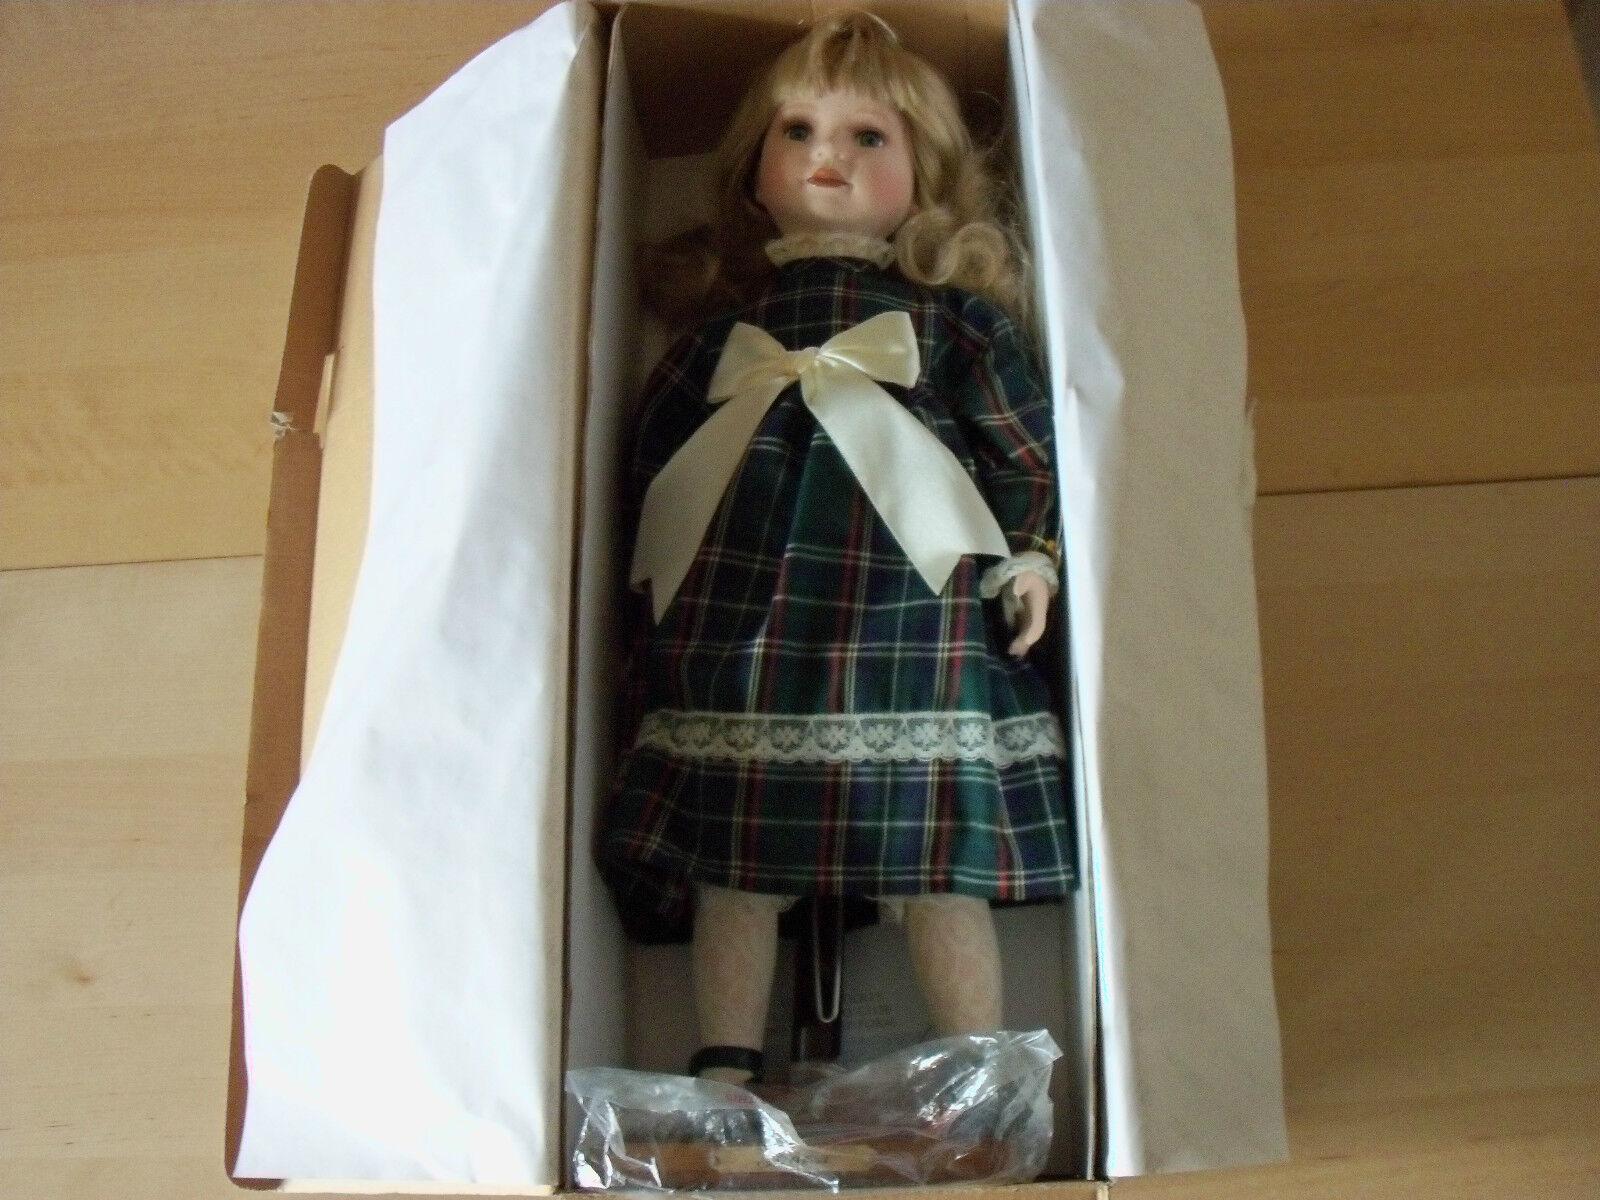 Superb Alberon 20 20 20  Porcelain Doll - Shona - Limited Edition - BNIB - FREE P&P e2d700